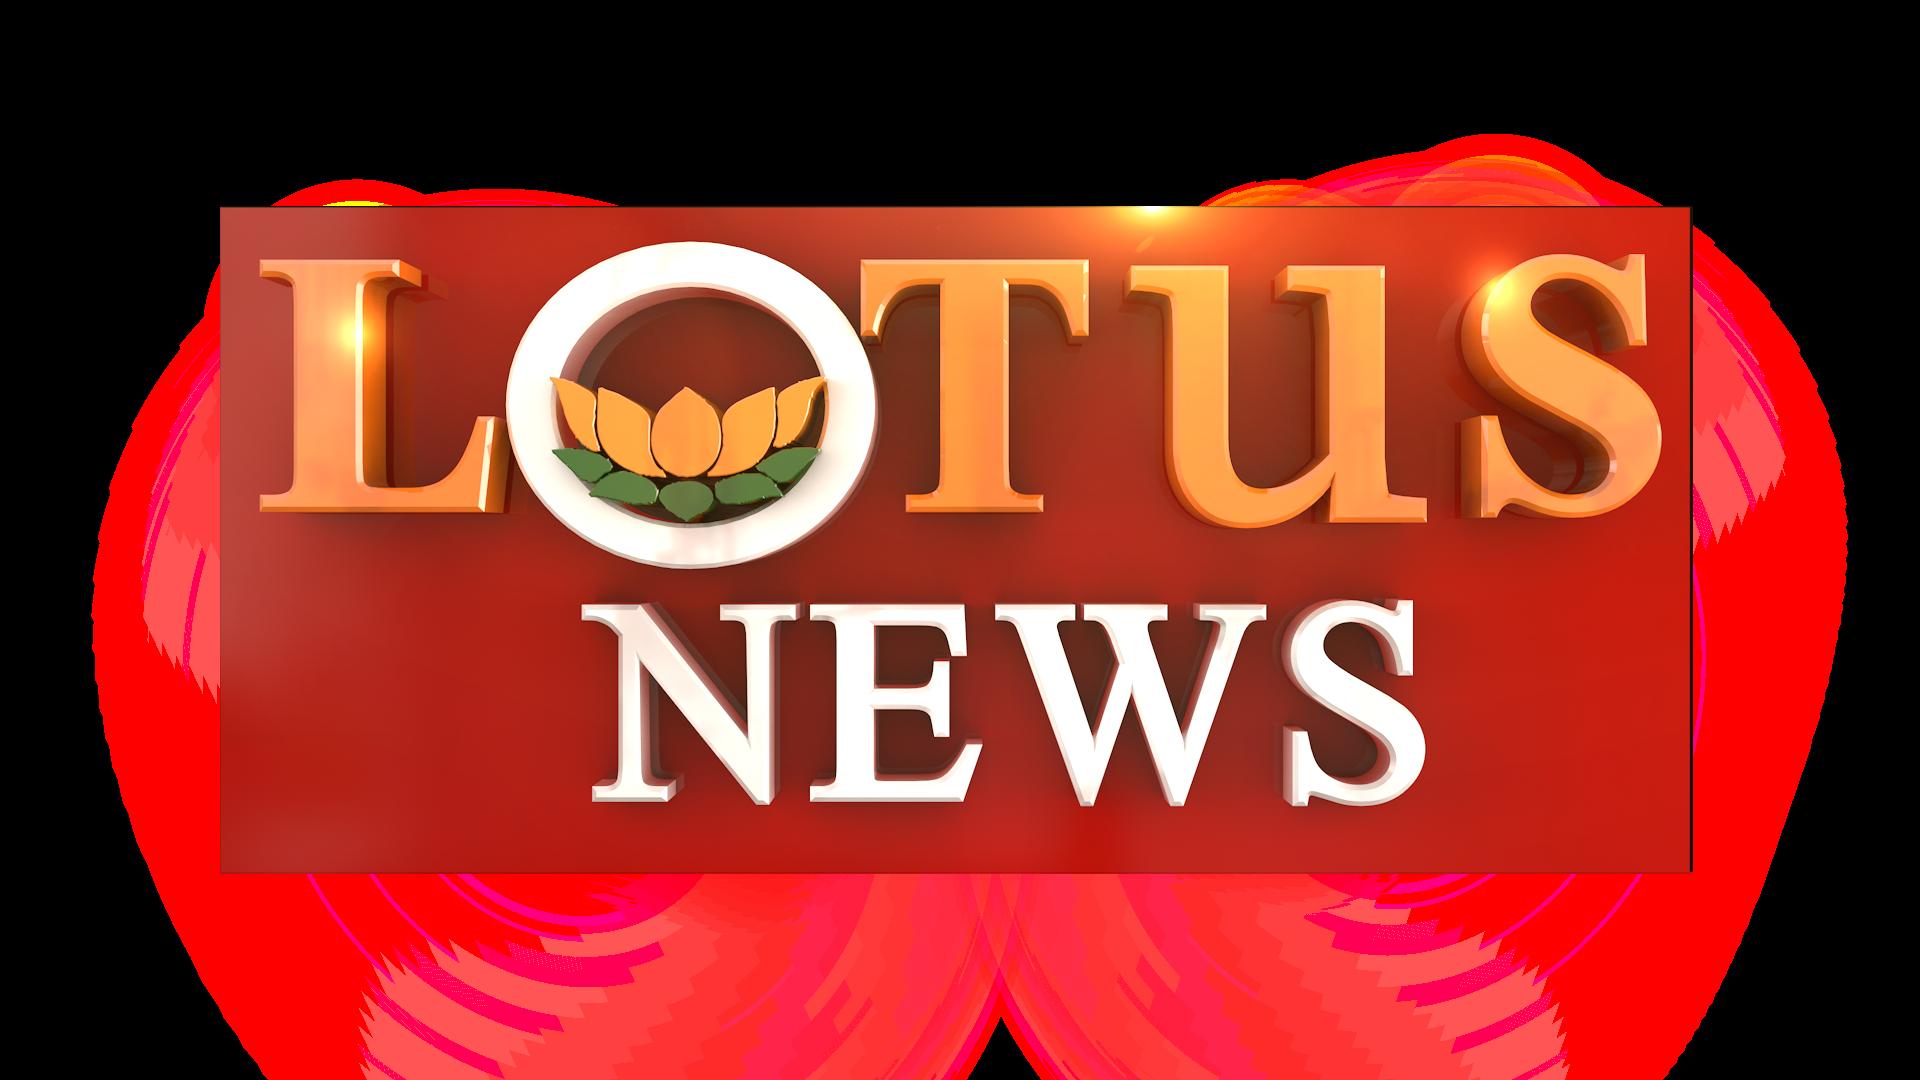 Lotus News - Wikipedia